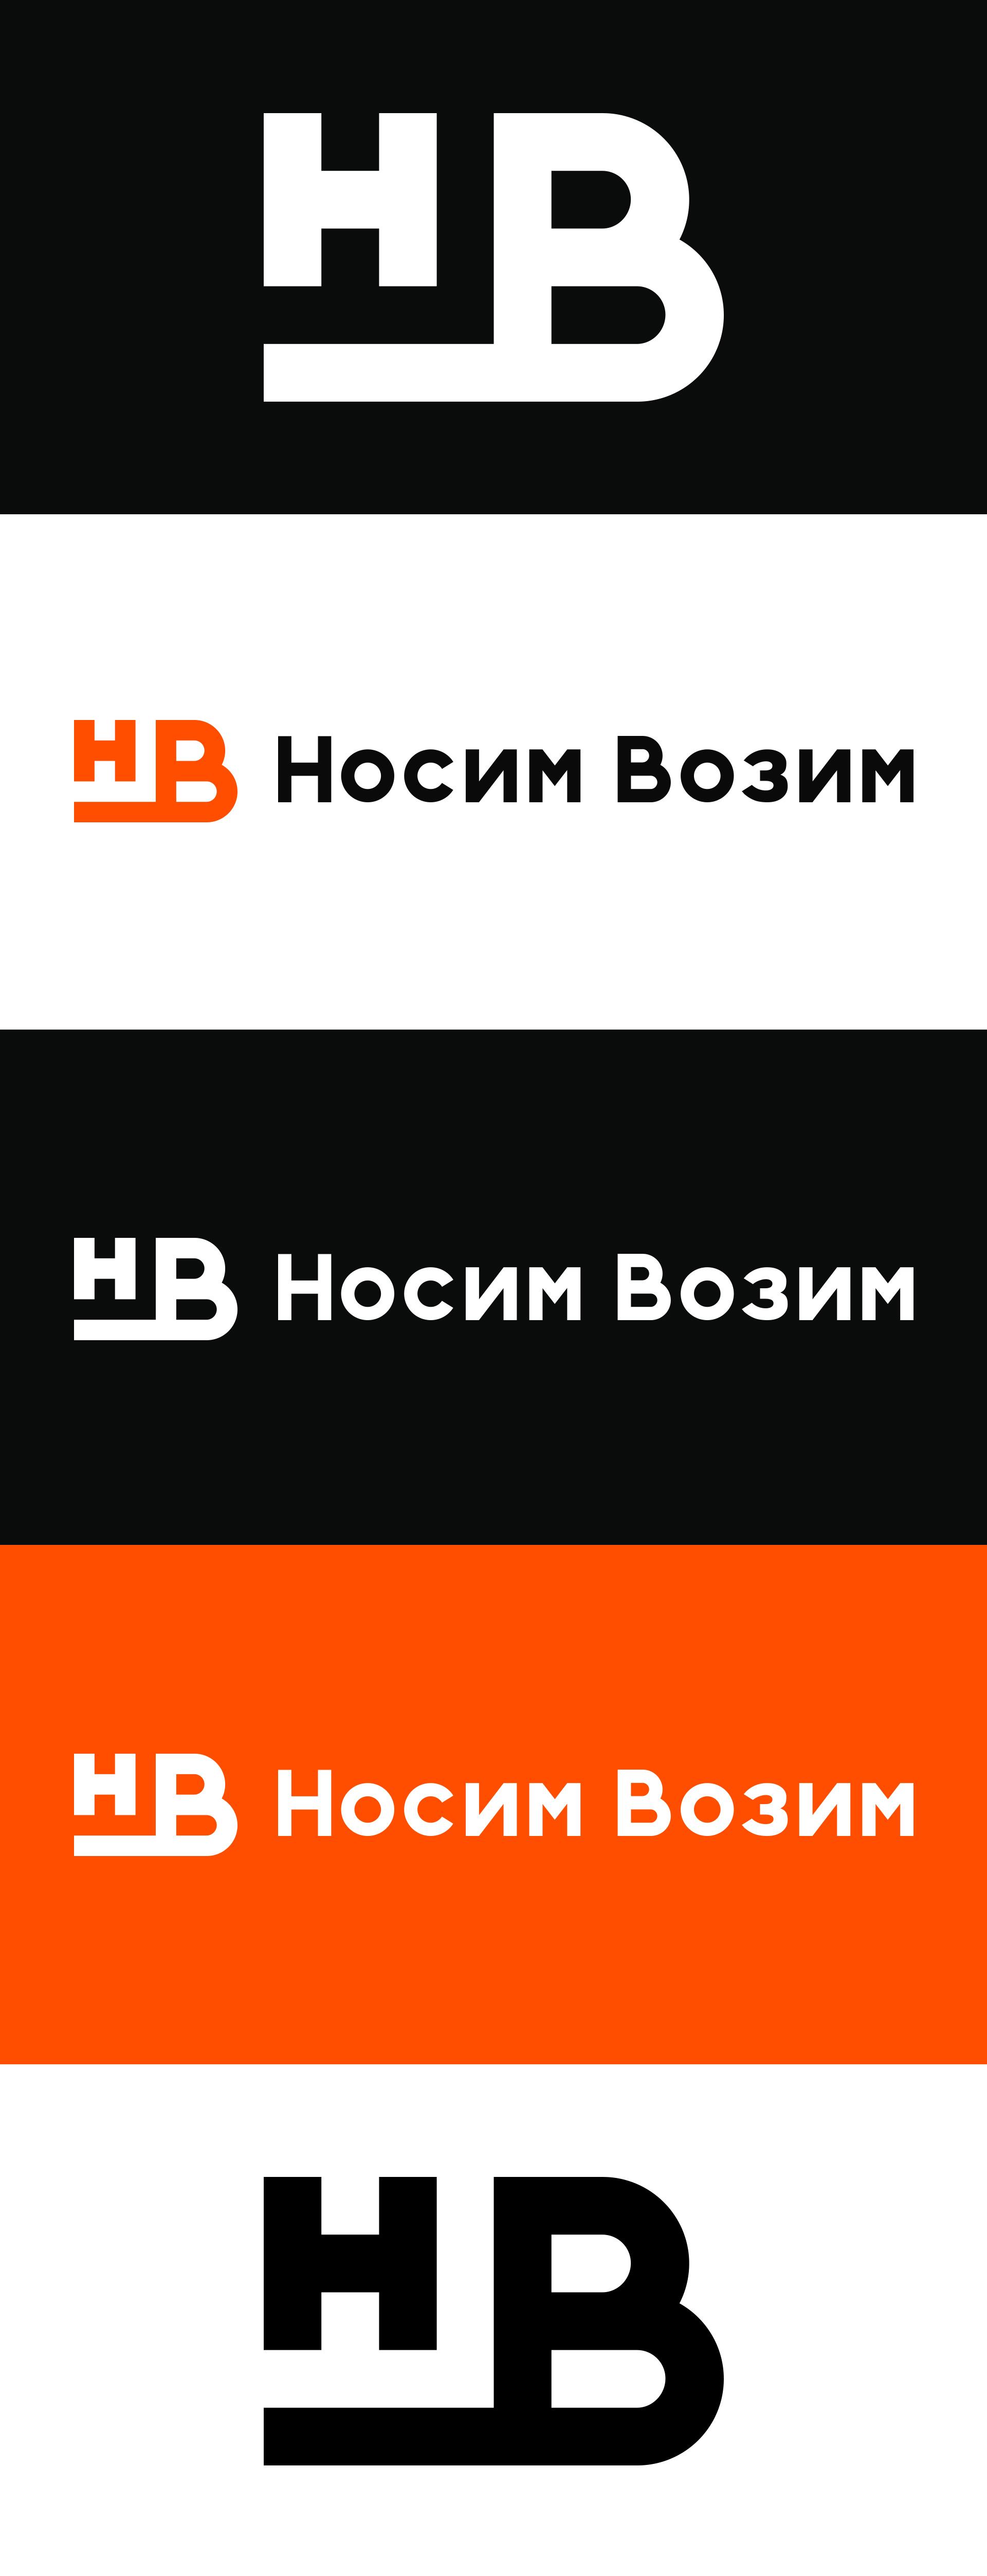 Логотип компании по перевозкам НосимВозим фото f_6145cf8b94c659e3.jpg